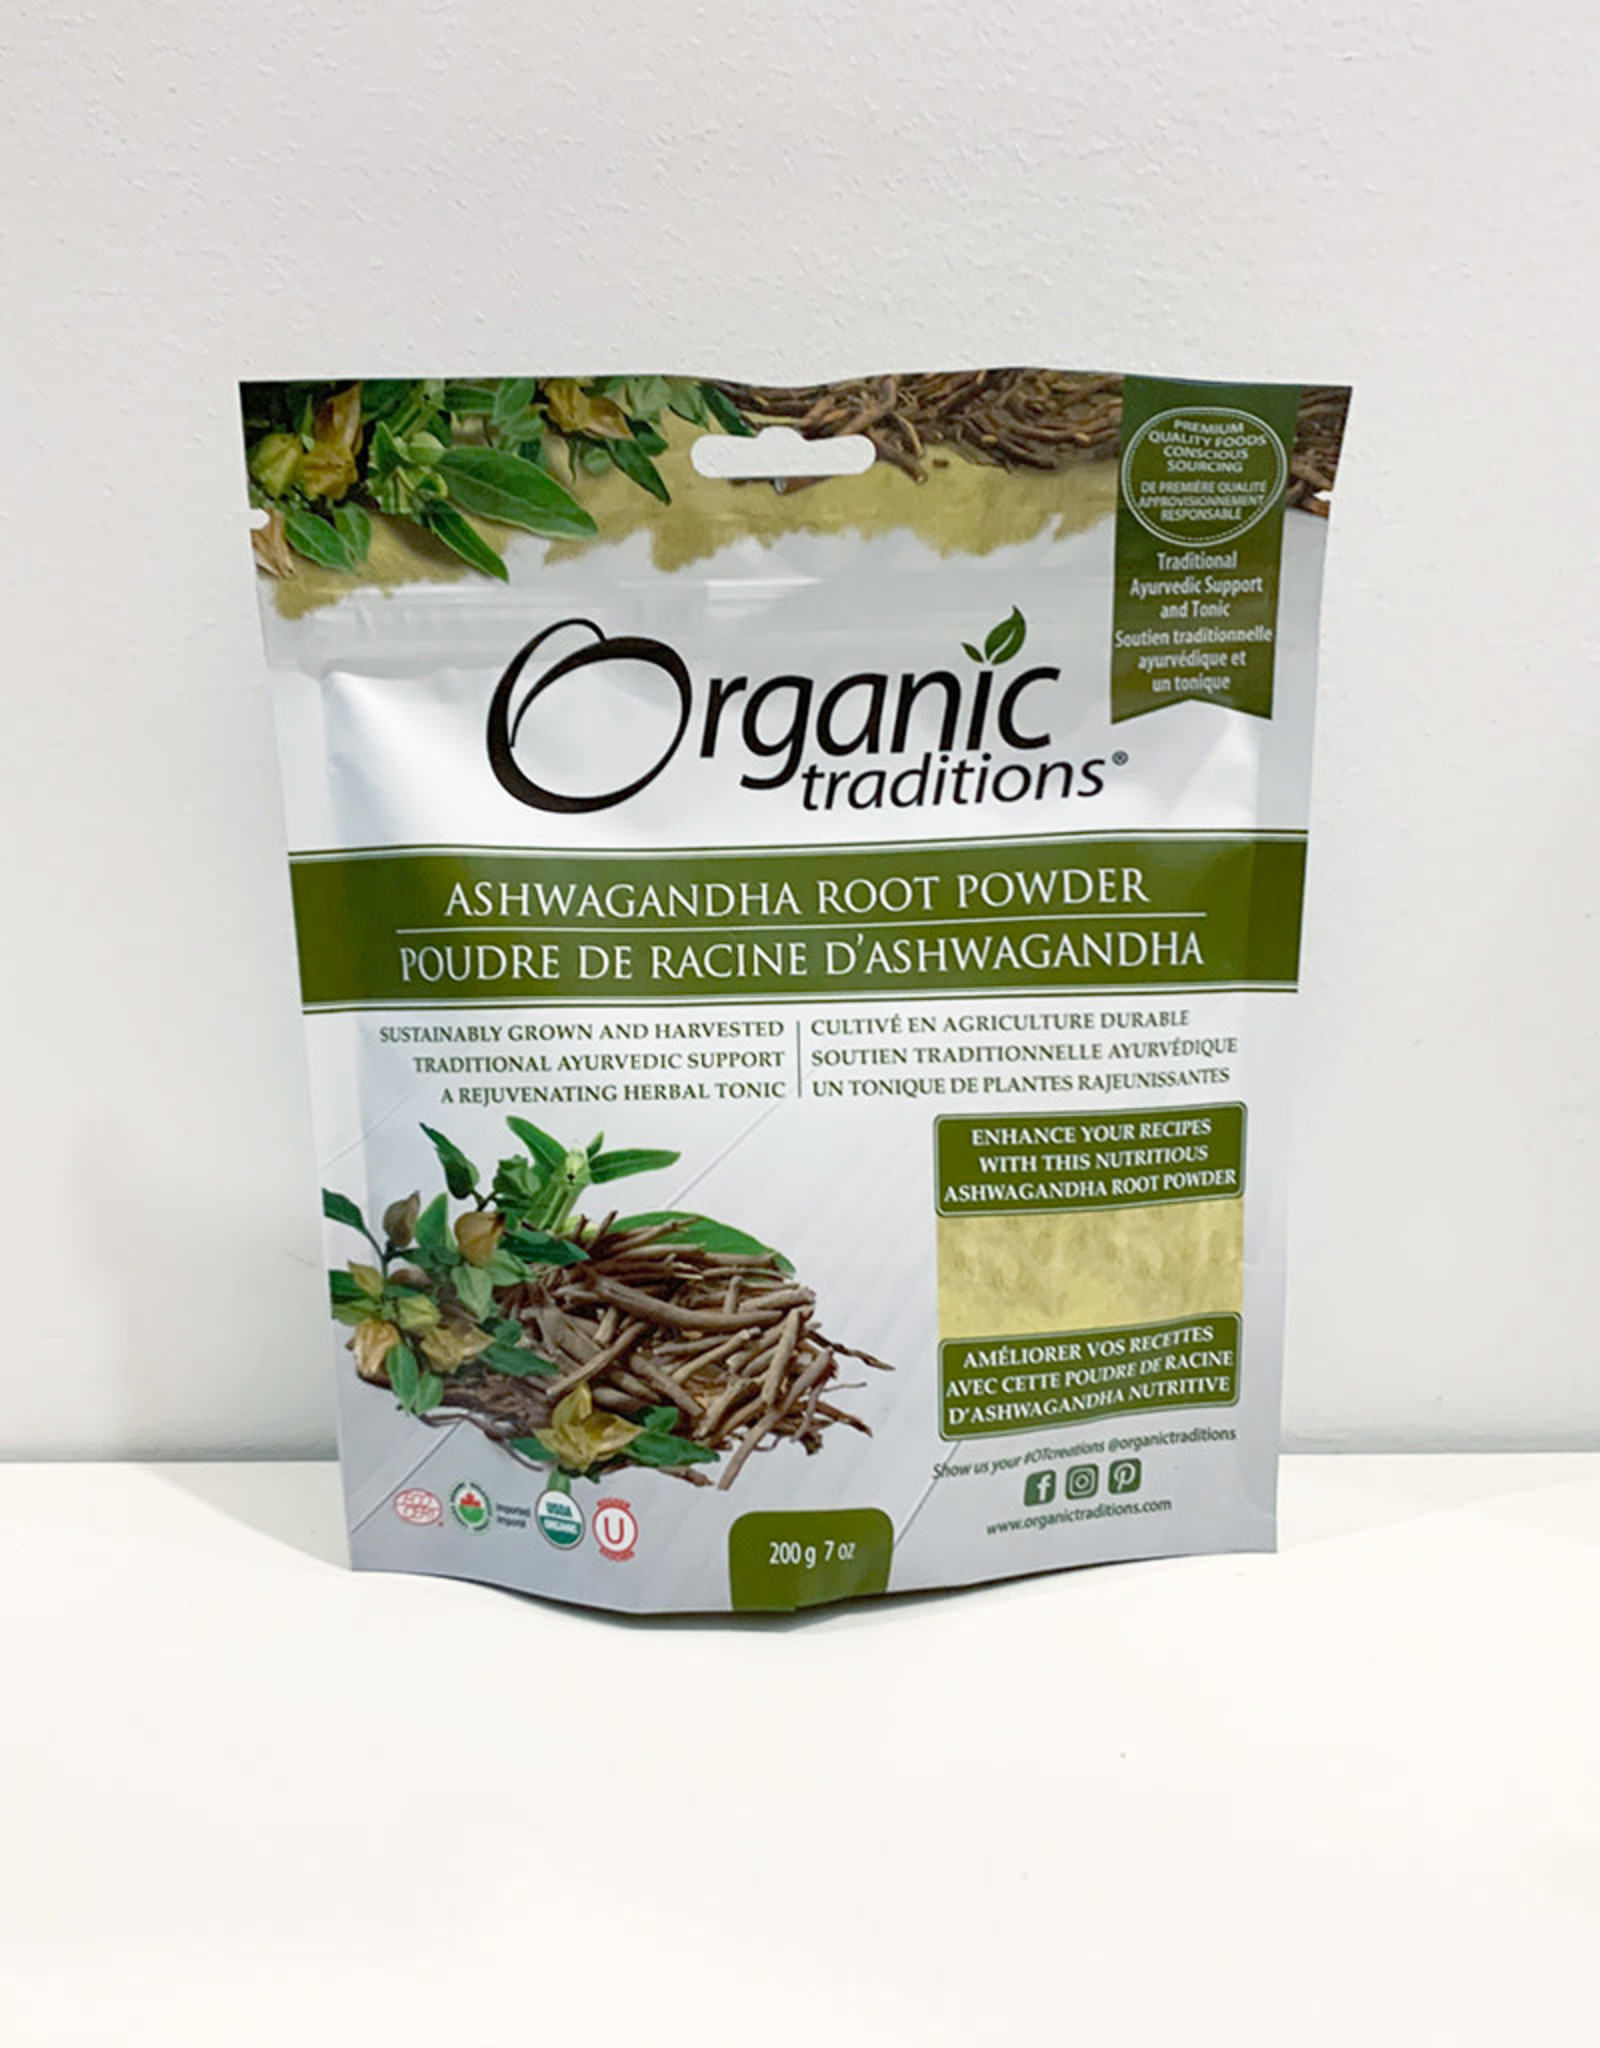 Organic Traditions Organic Traditions - Ashwagandha Powder (200g)